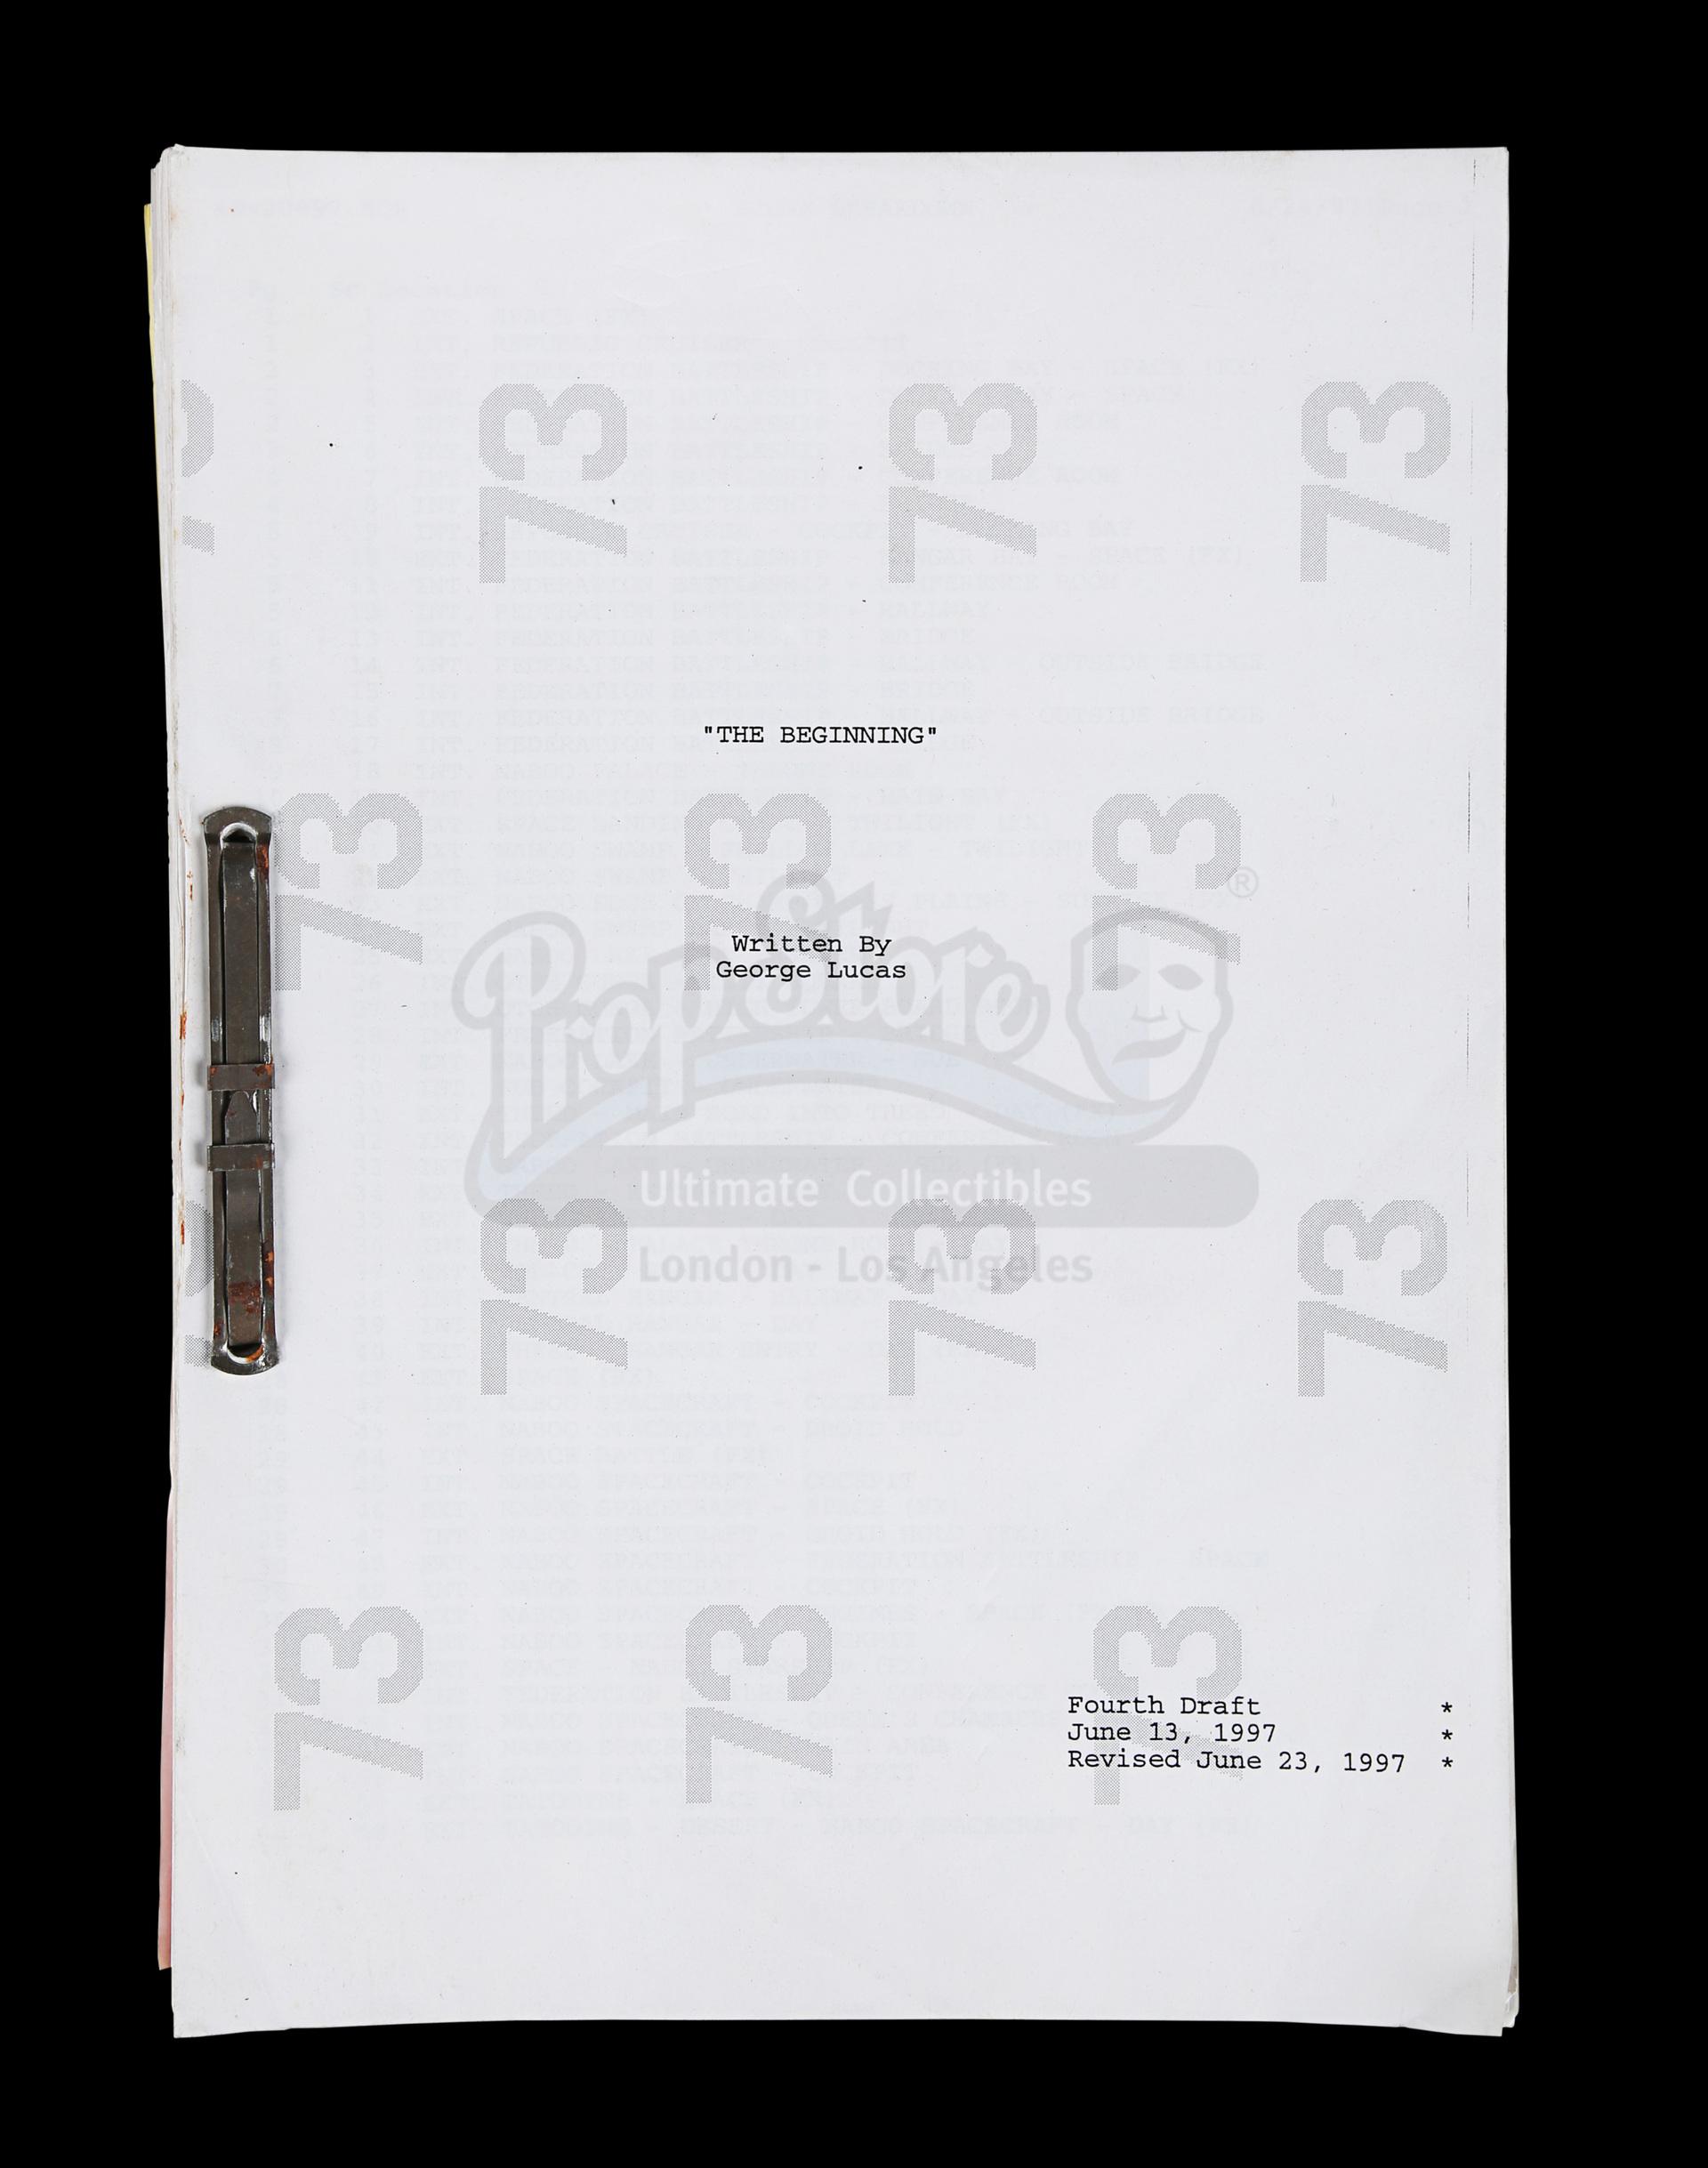 Lot # 1122: STAR WARS - EP I - THE PHANTOM MENACE - Revised Fourth Draft Script